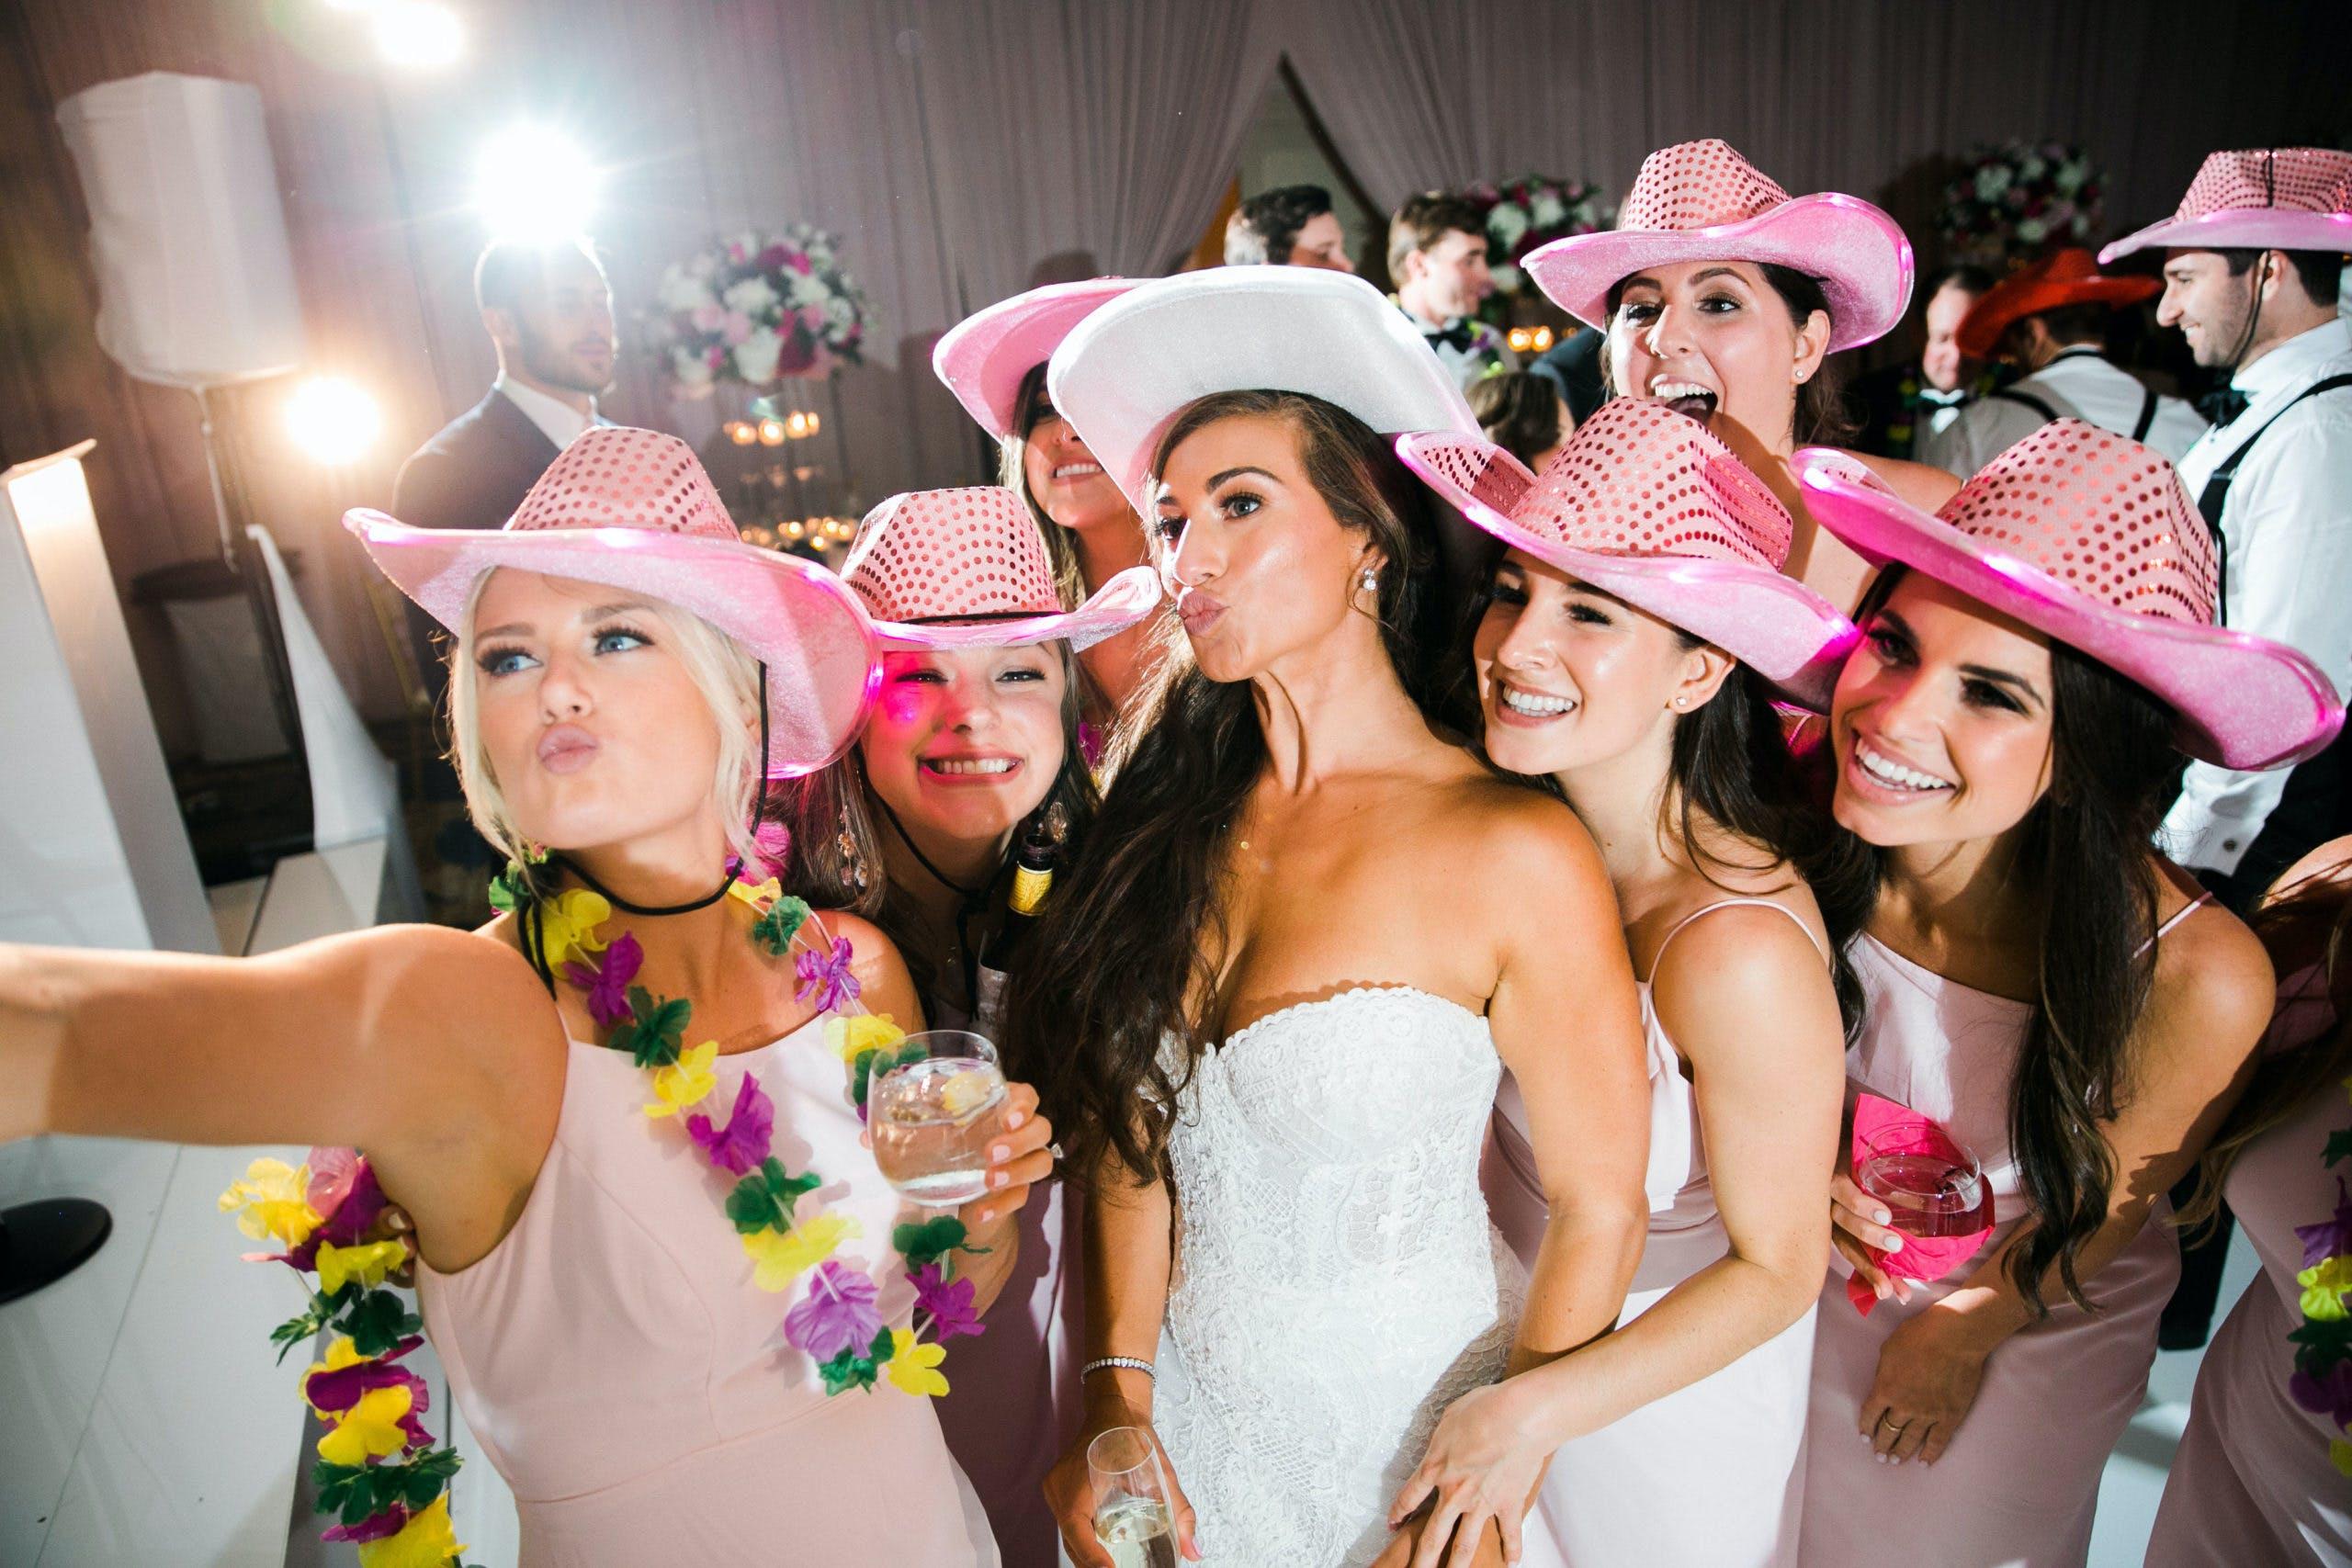 girls take selfie-style photo wearing pink cowboy hats l PartySlate